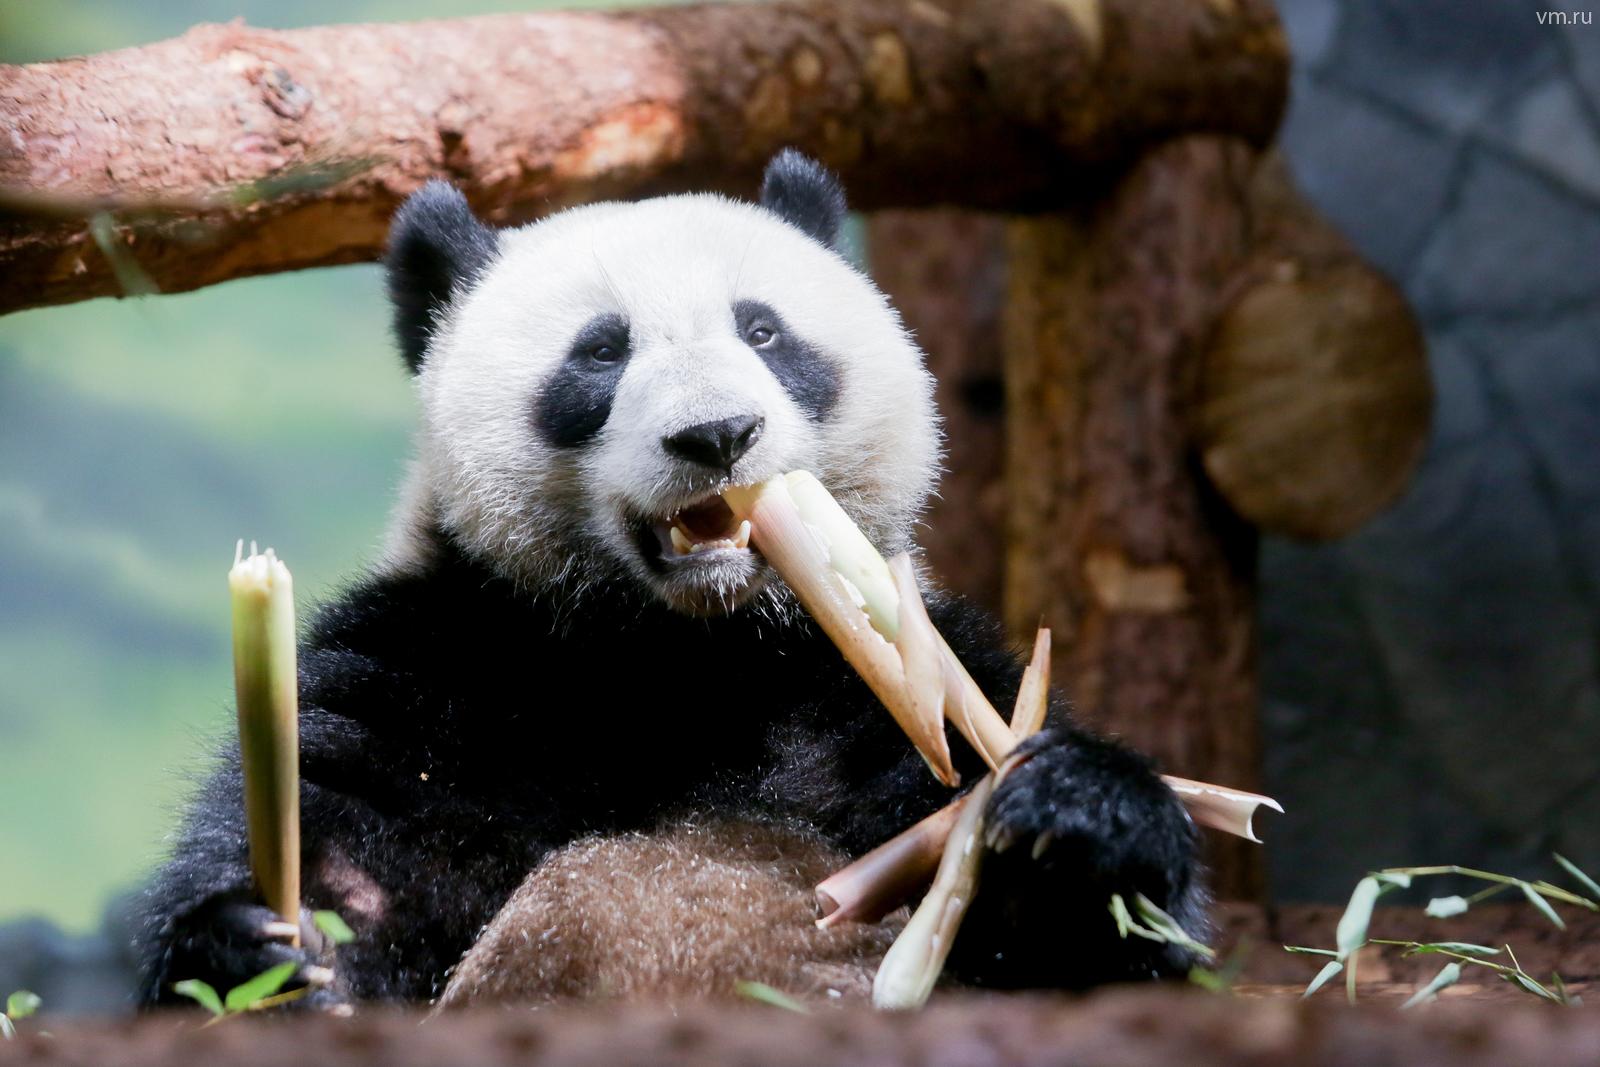 Можно бесконечно смотреть на то, как едят панды, а едят они много / Анна Иванцова, «Вечерняя Москва»